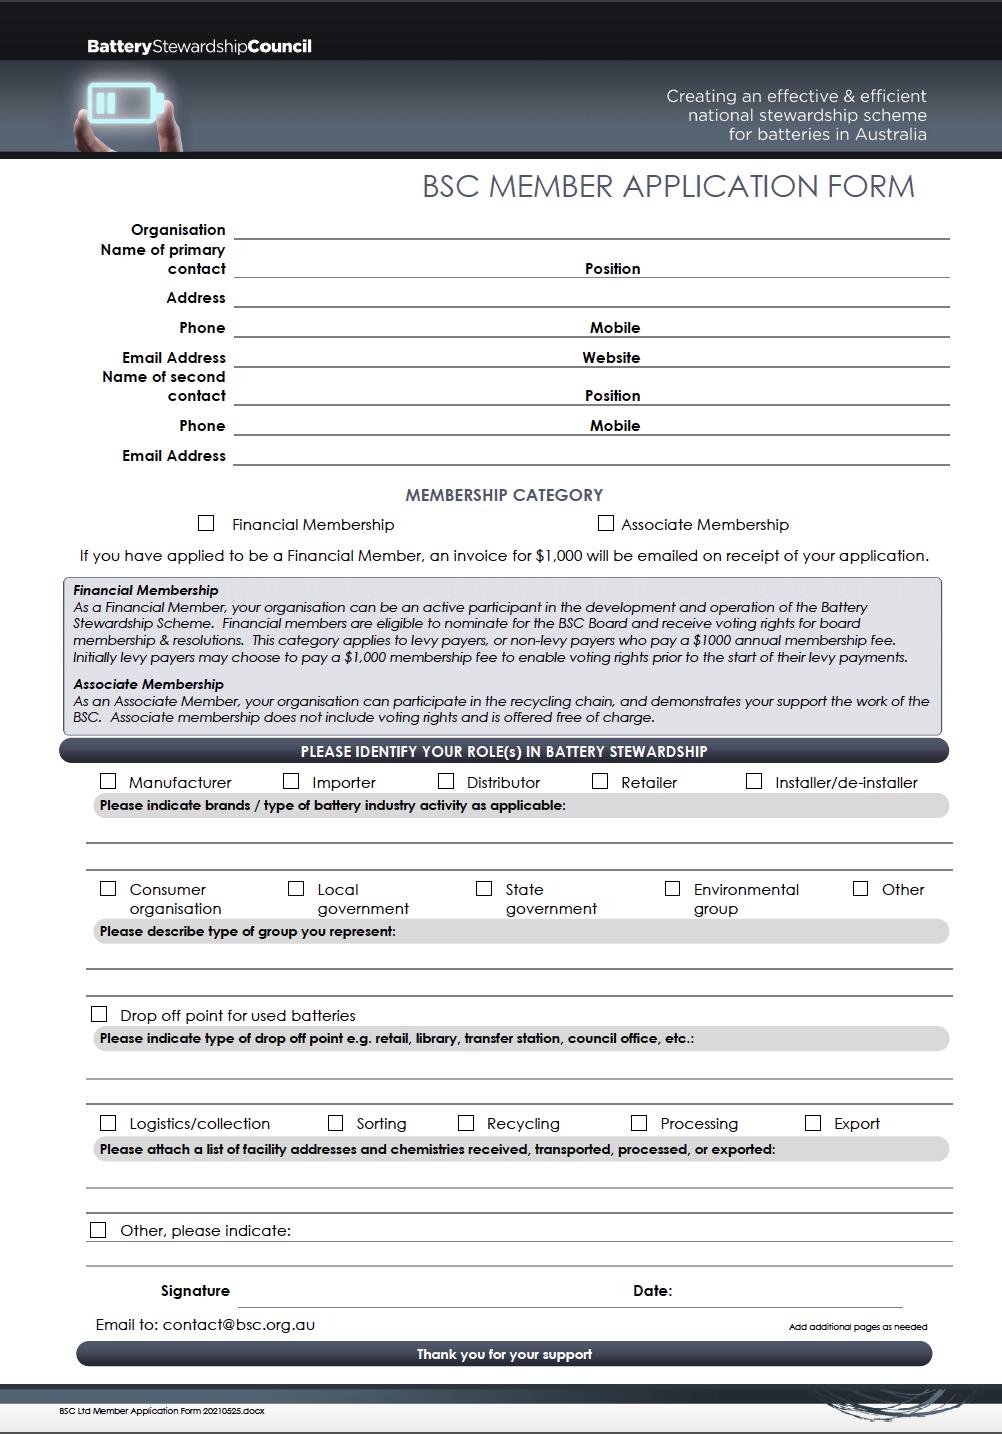 BSC Application Form